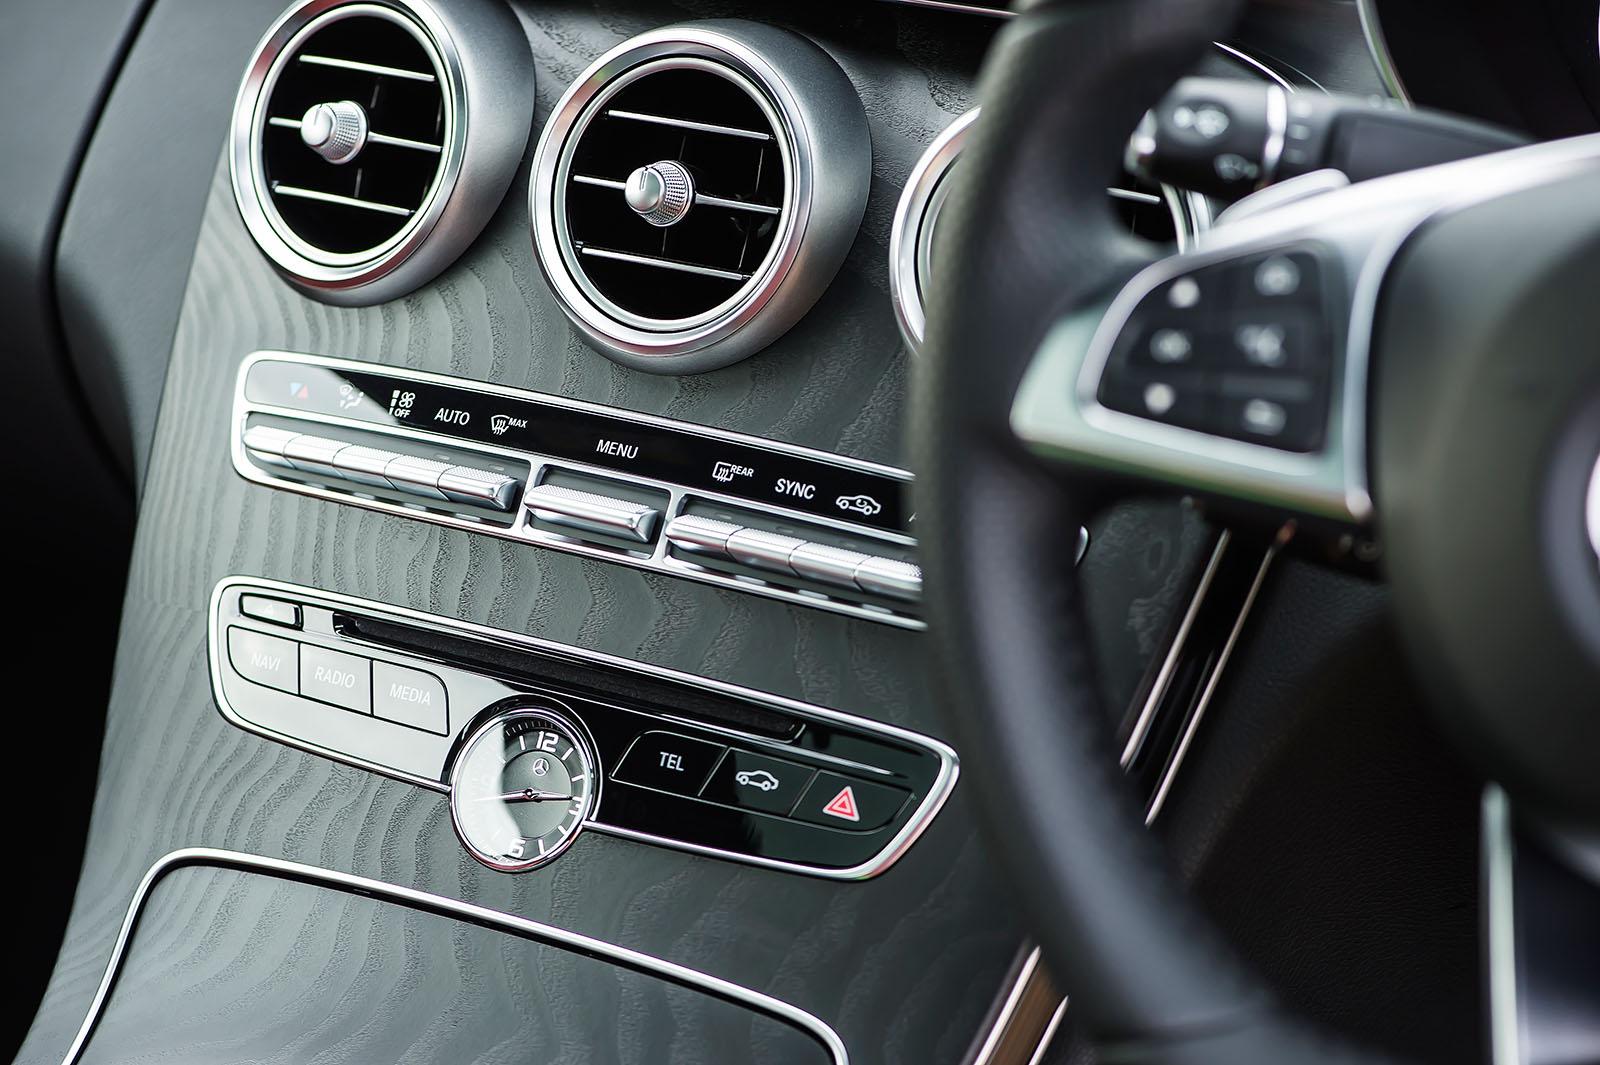 Mercedes C250 AMG 07